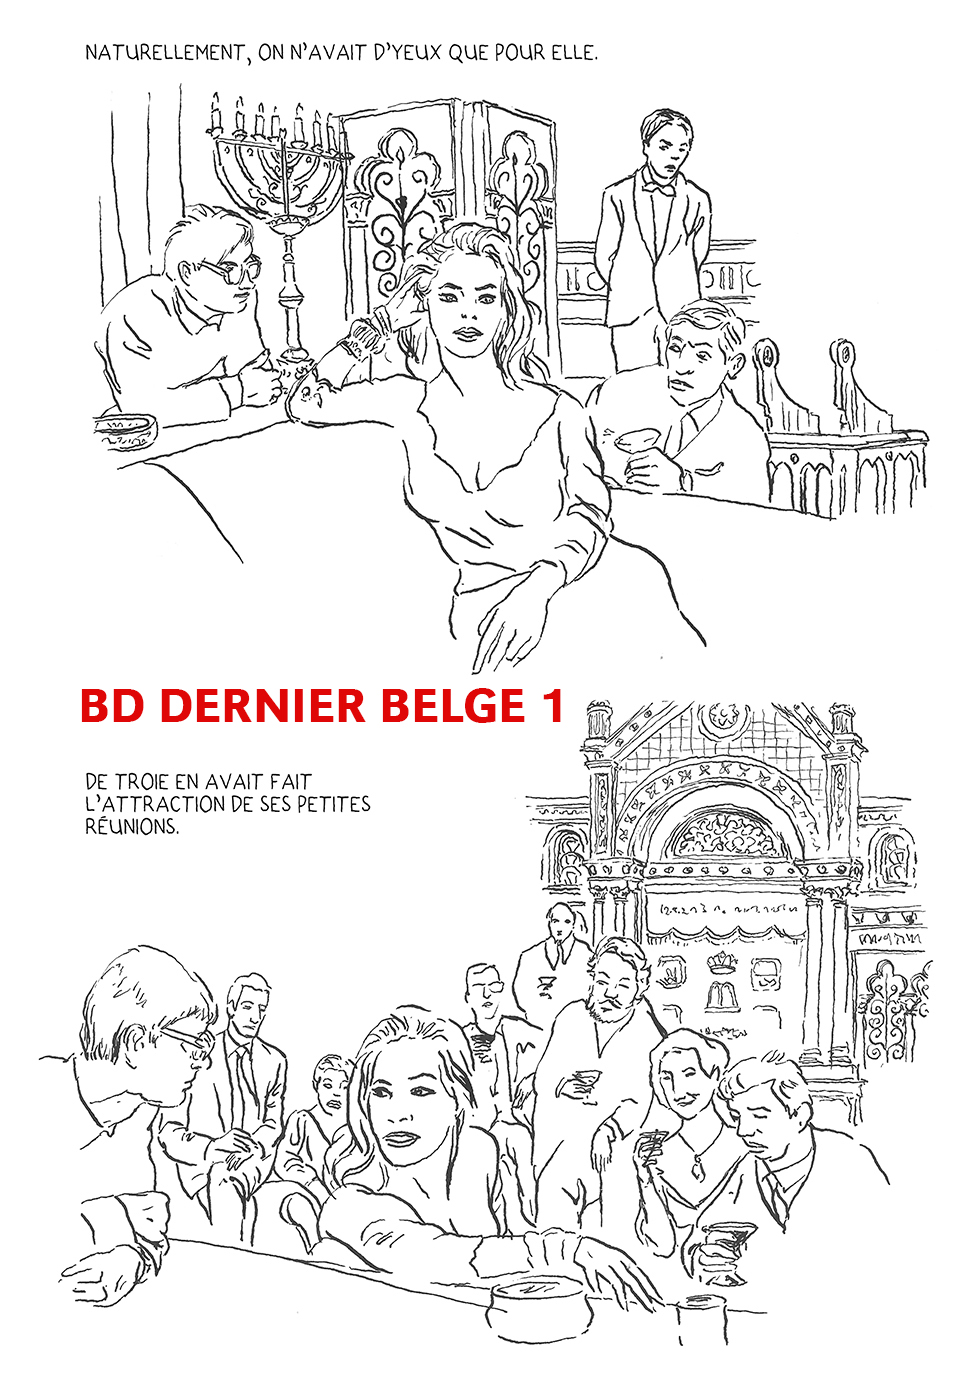 bd_dernier belge_1